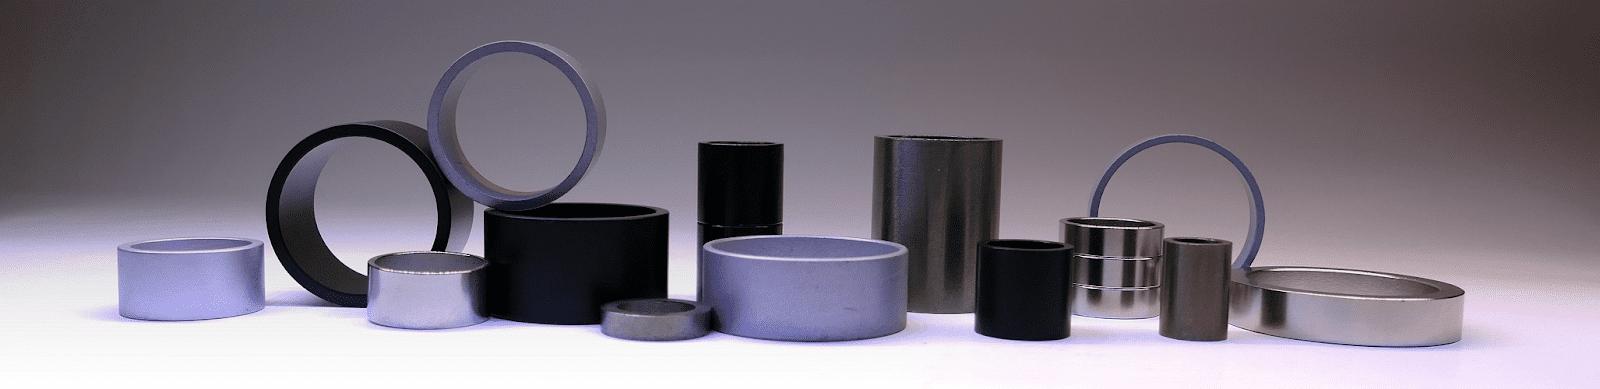 Radial Neodymium Magnets